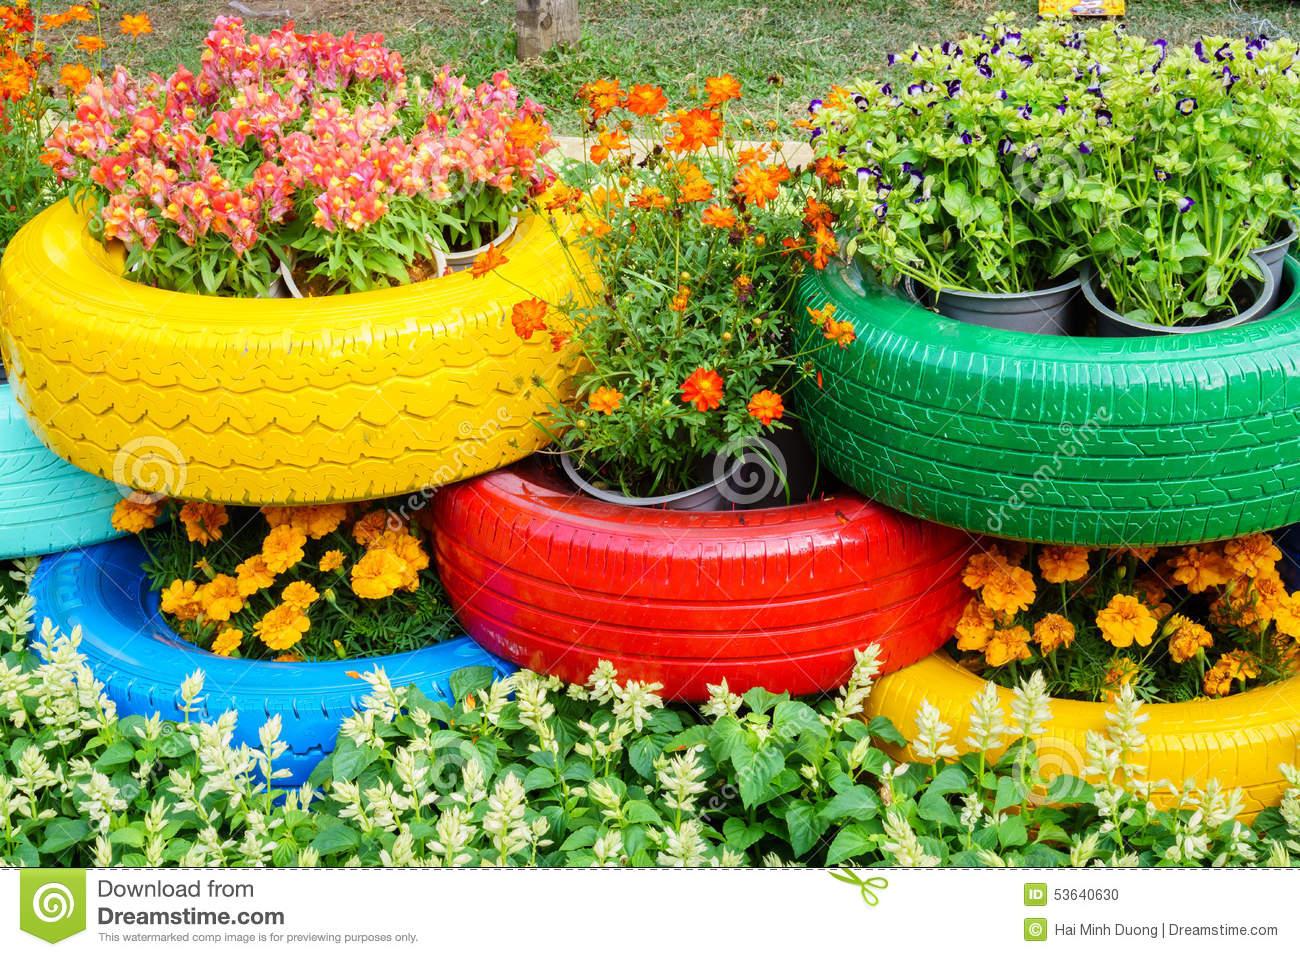 Цветы из покрышек